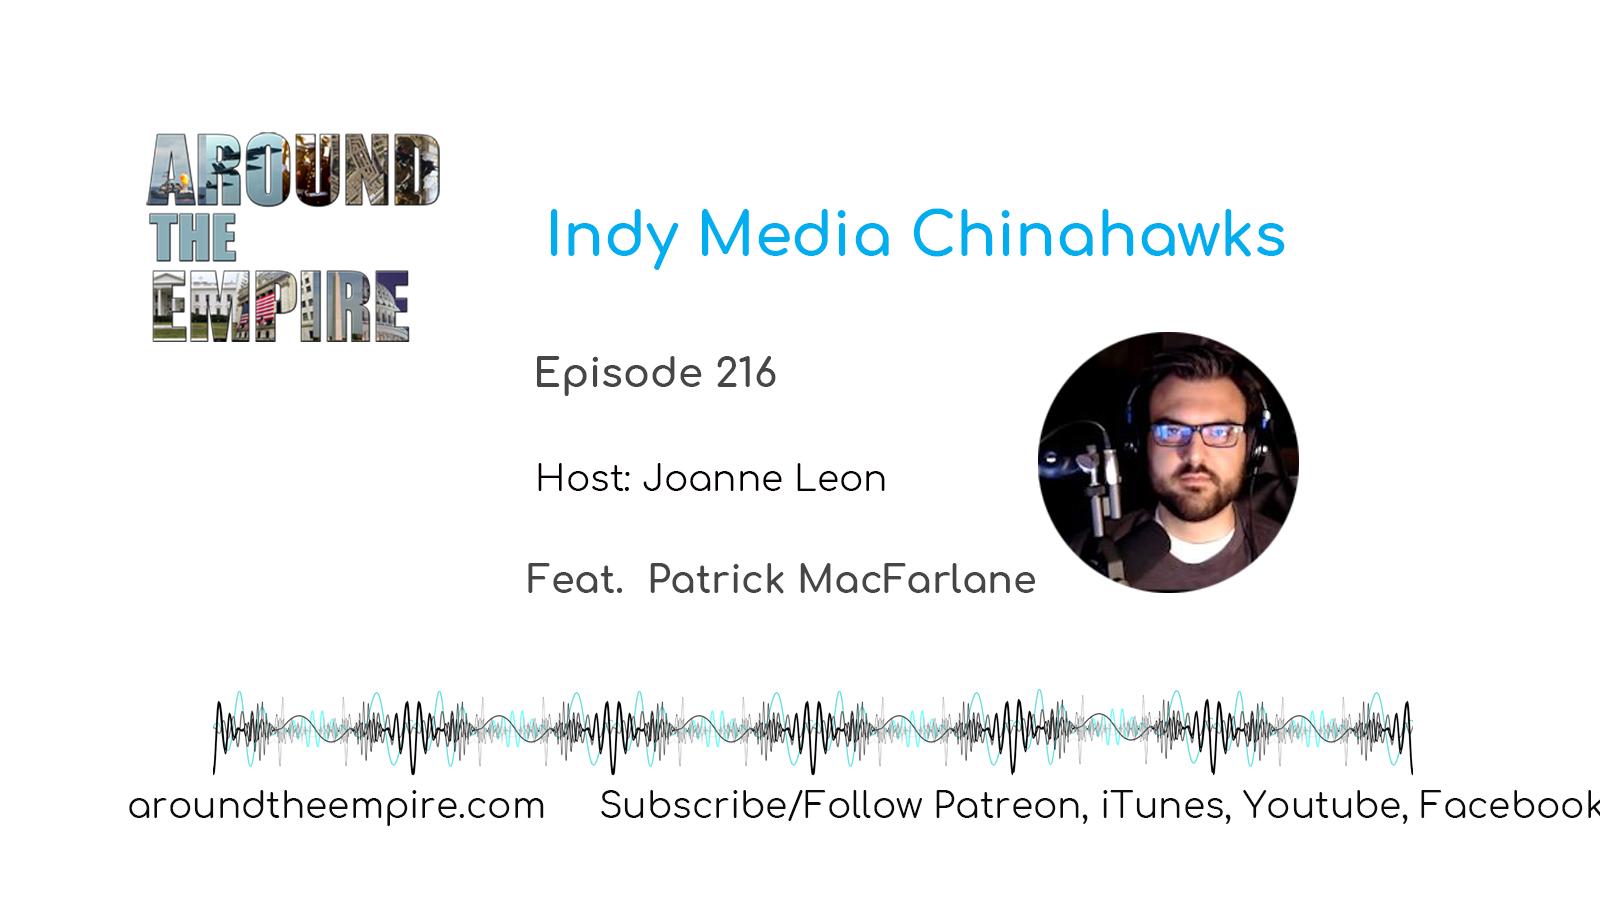 Ep 216 Indy Media Chinahawks (Swapcast) Patrick MacFarlane